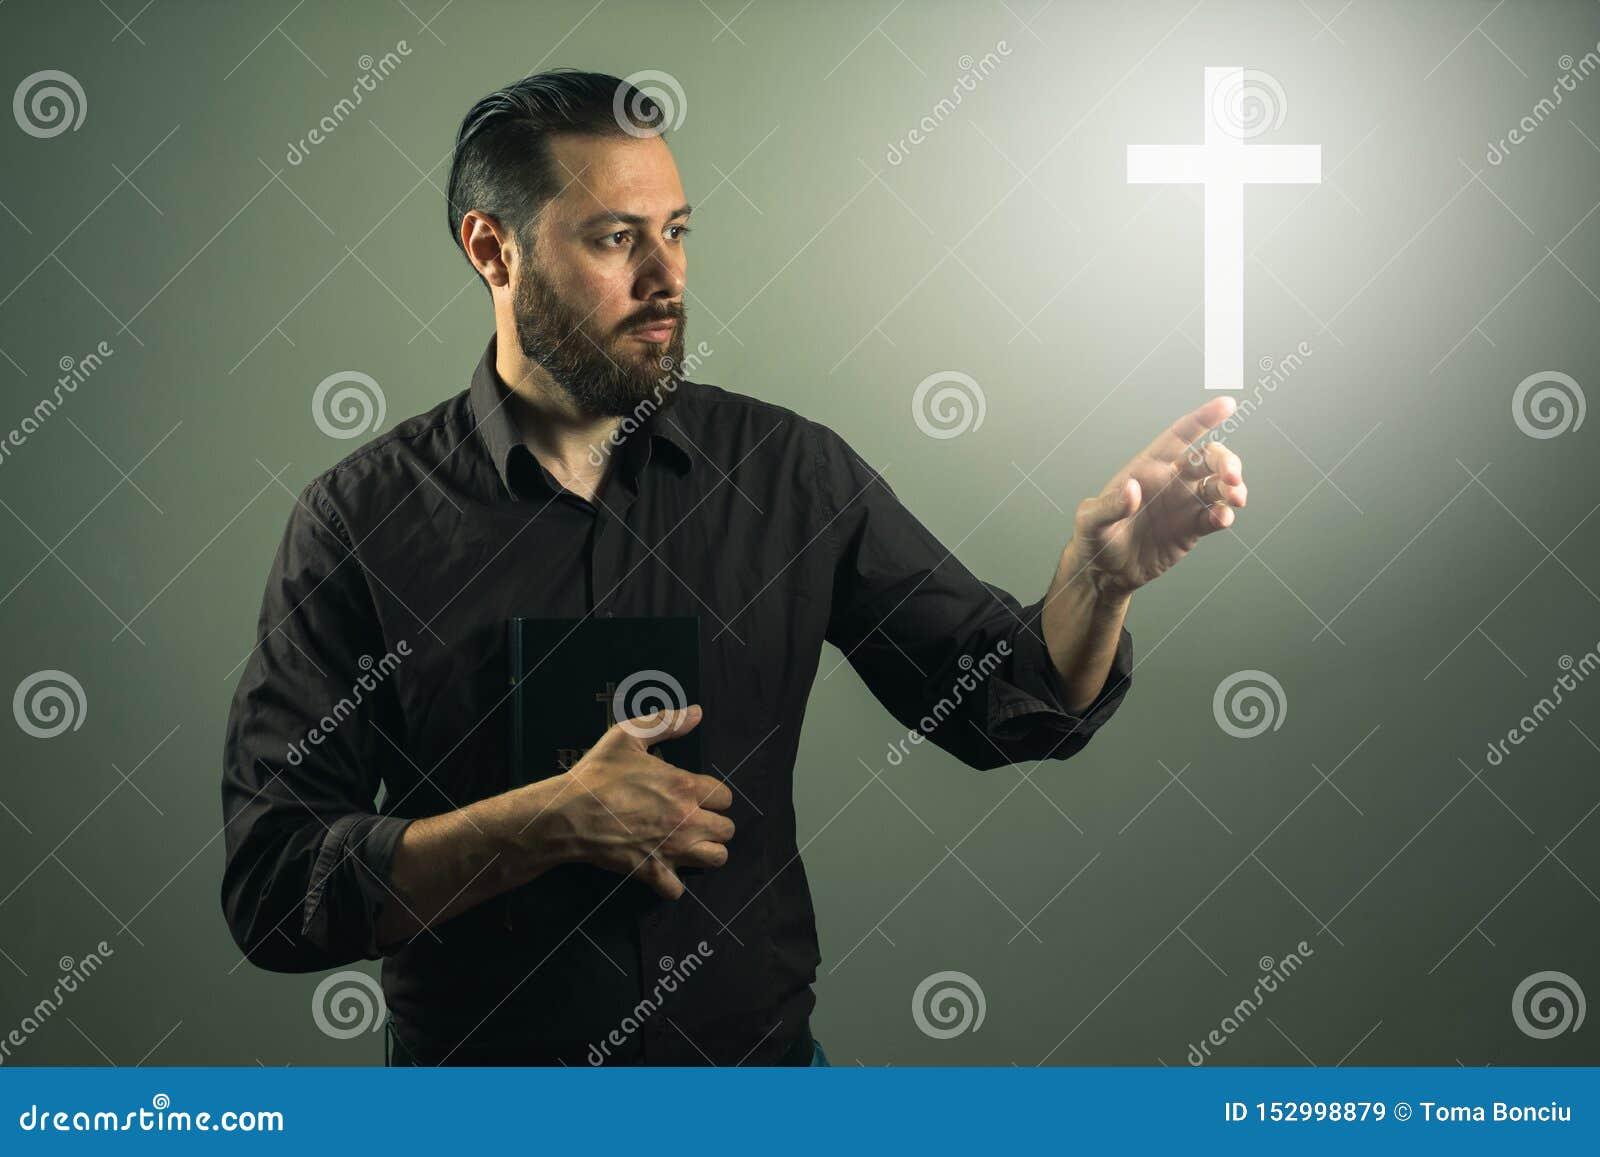 Beard handome man touchink a cross appearing in the air